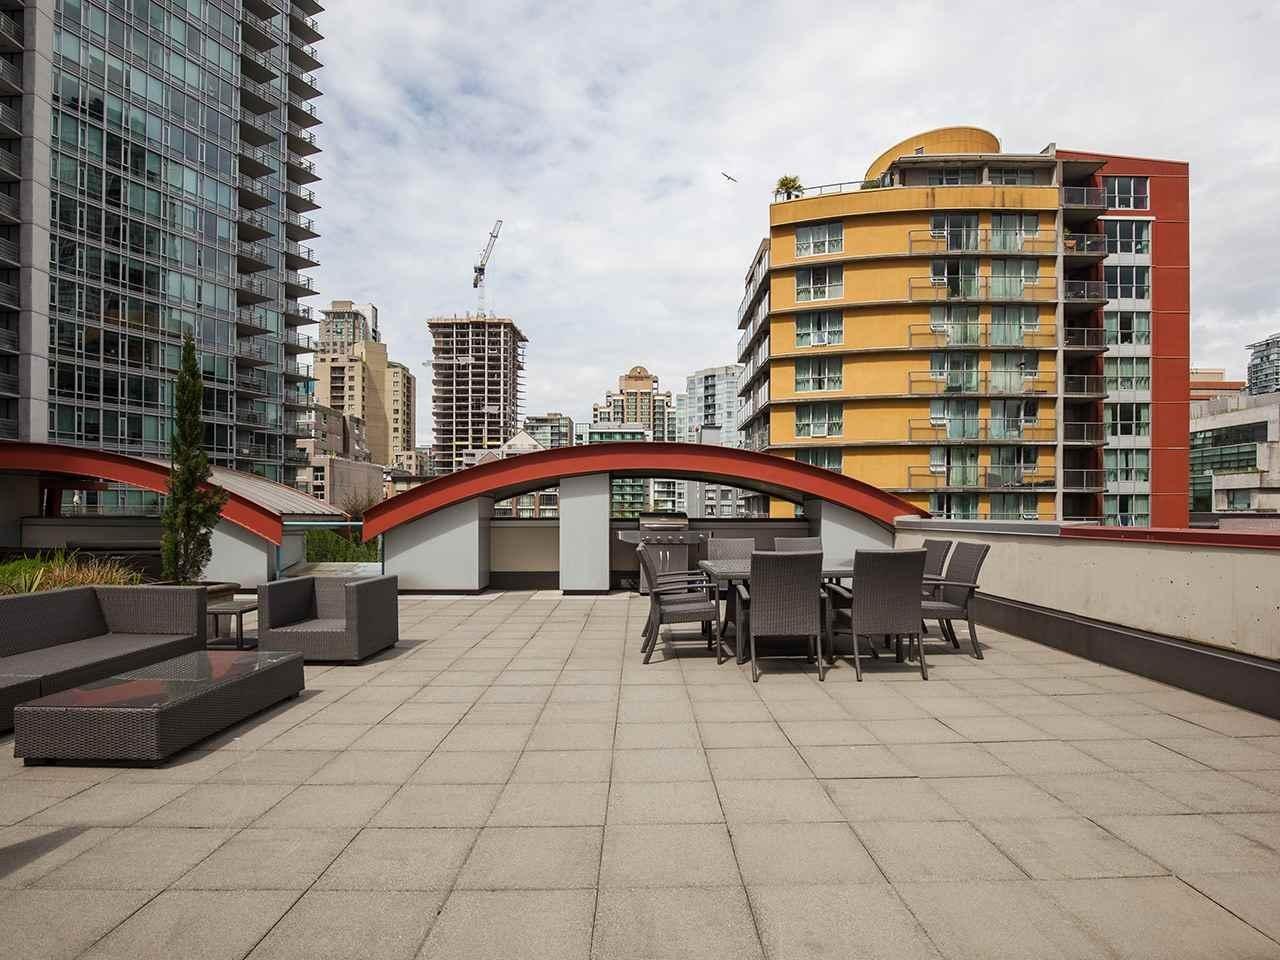 301 1238 SEYMOUR STREET, Vancouver - R2168508